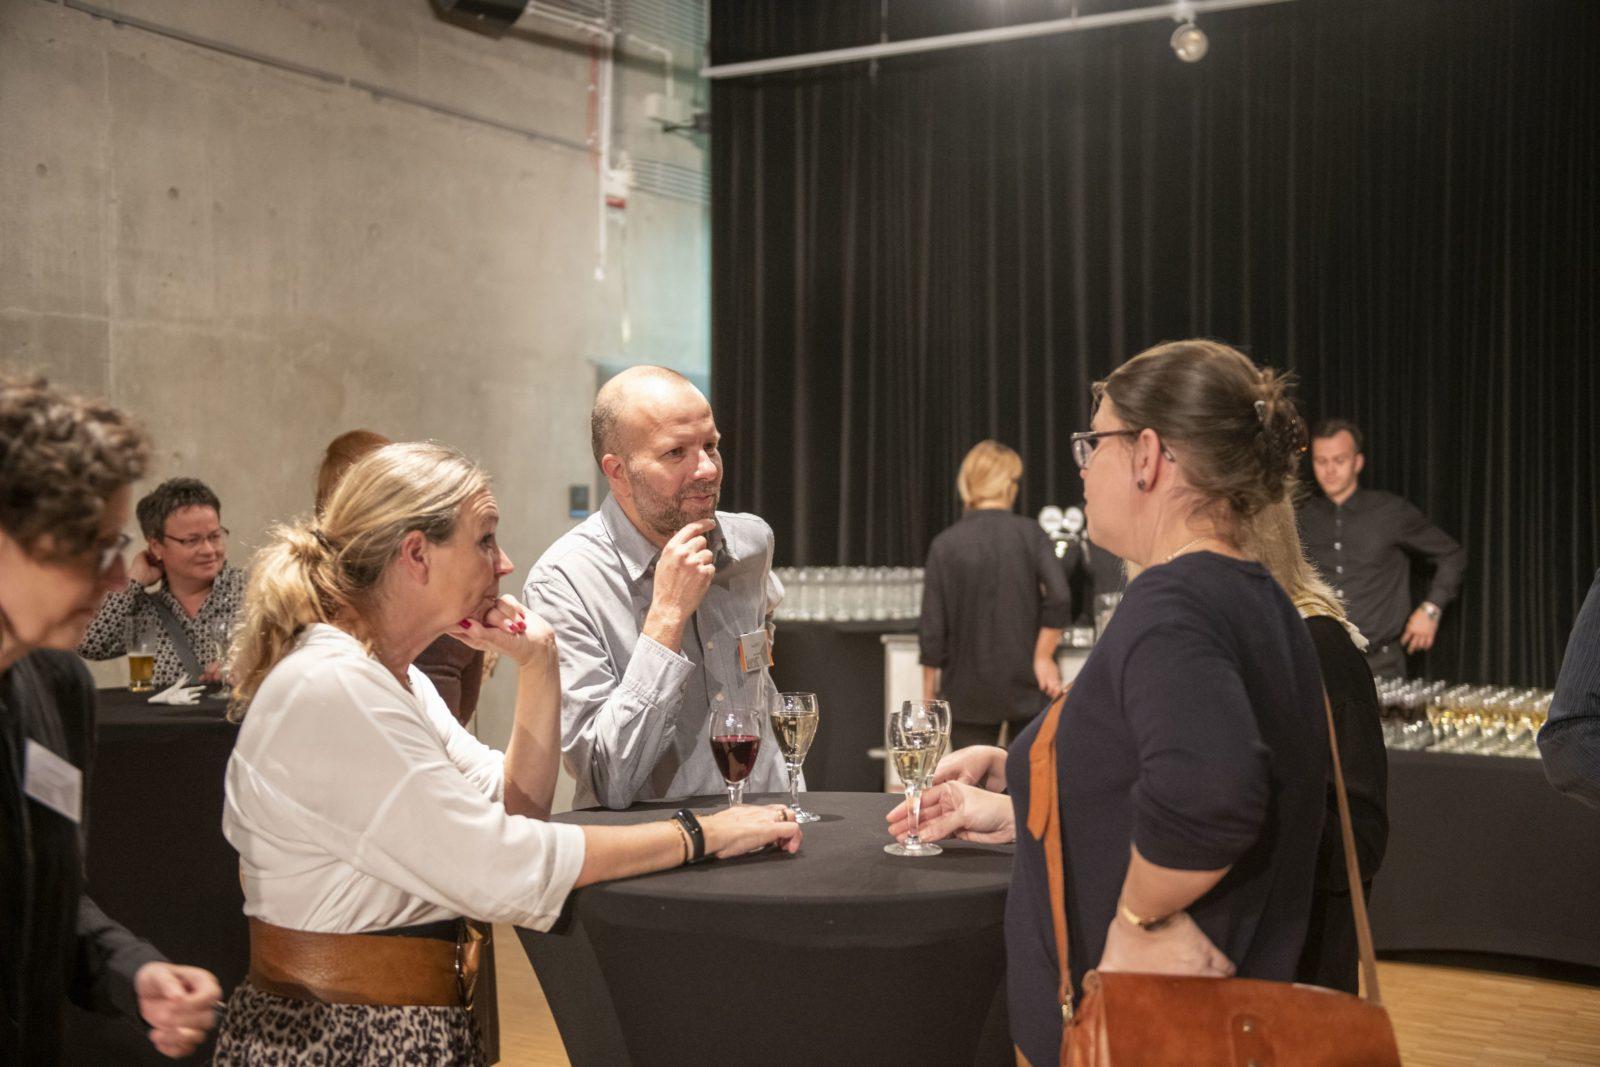 Warschau_2019_Empfang_reception_Thursday_Warsaw_Stasiuk_Konrad_098